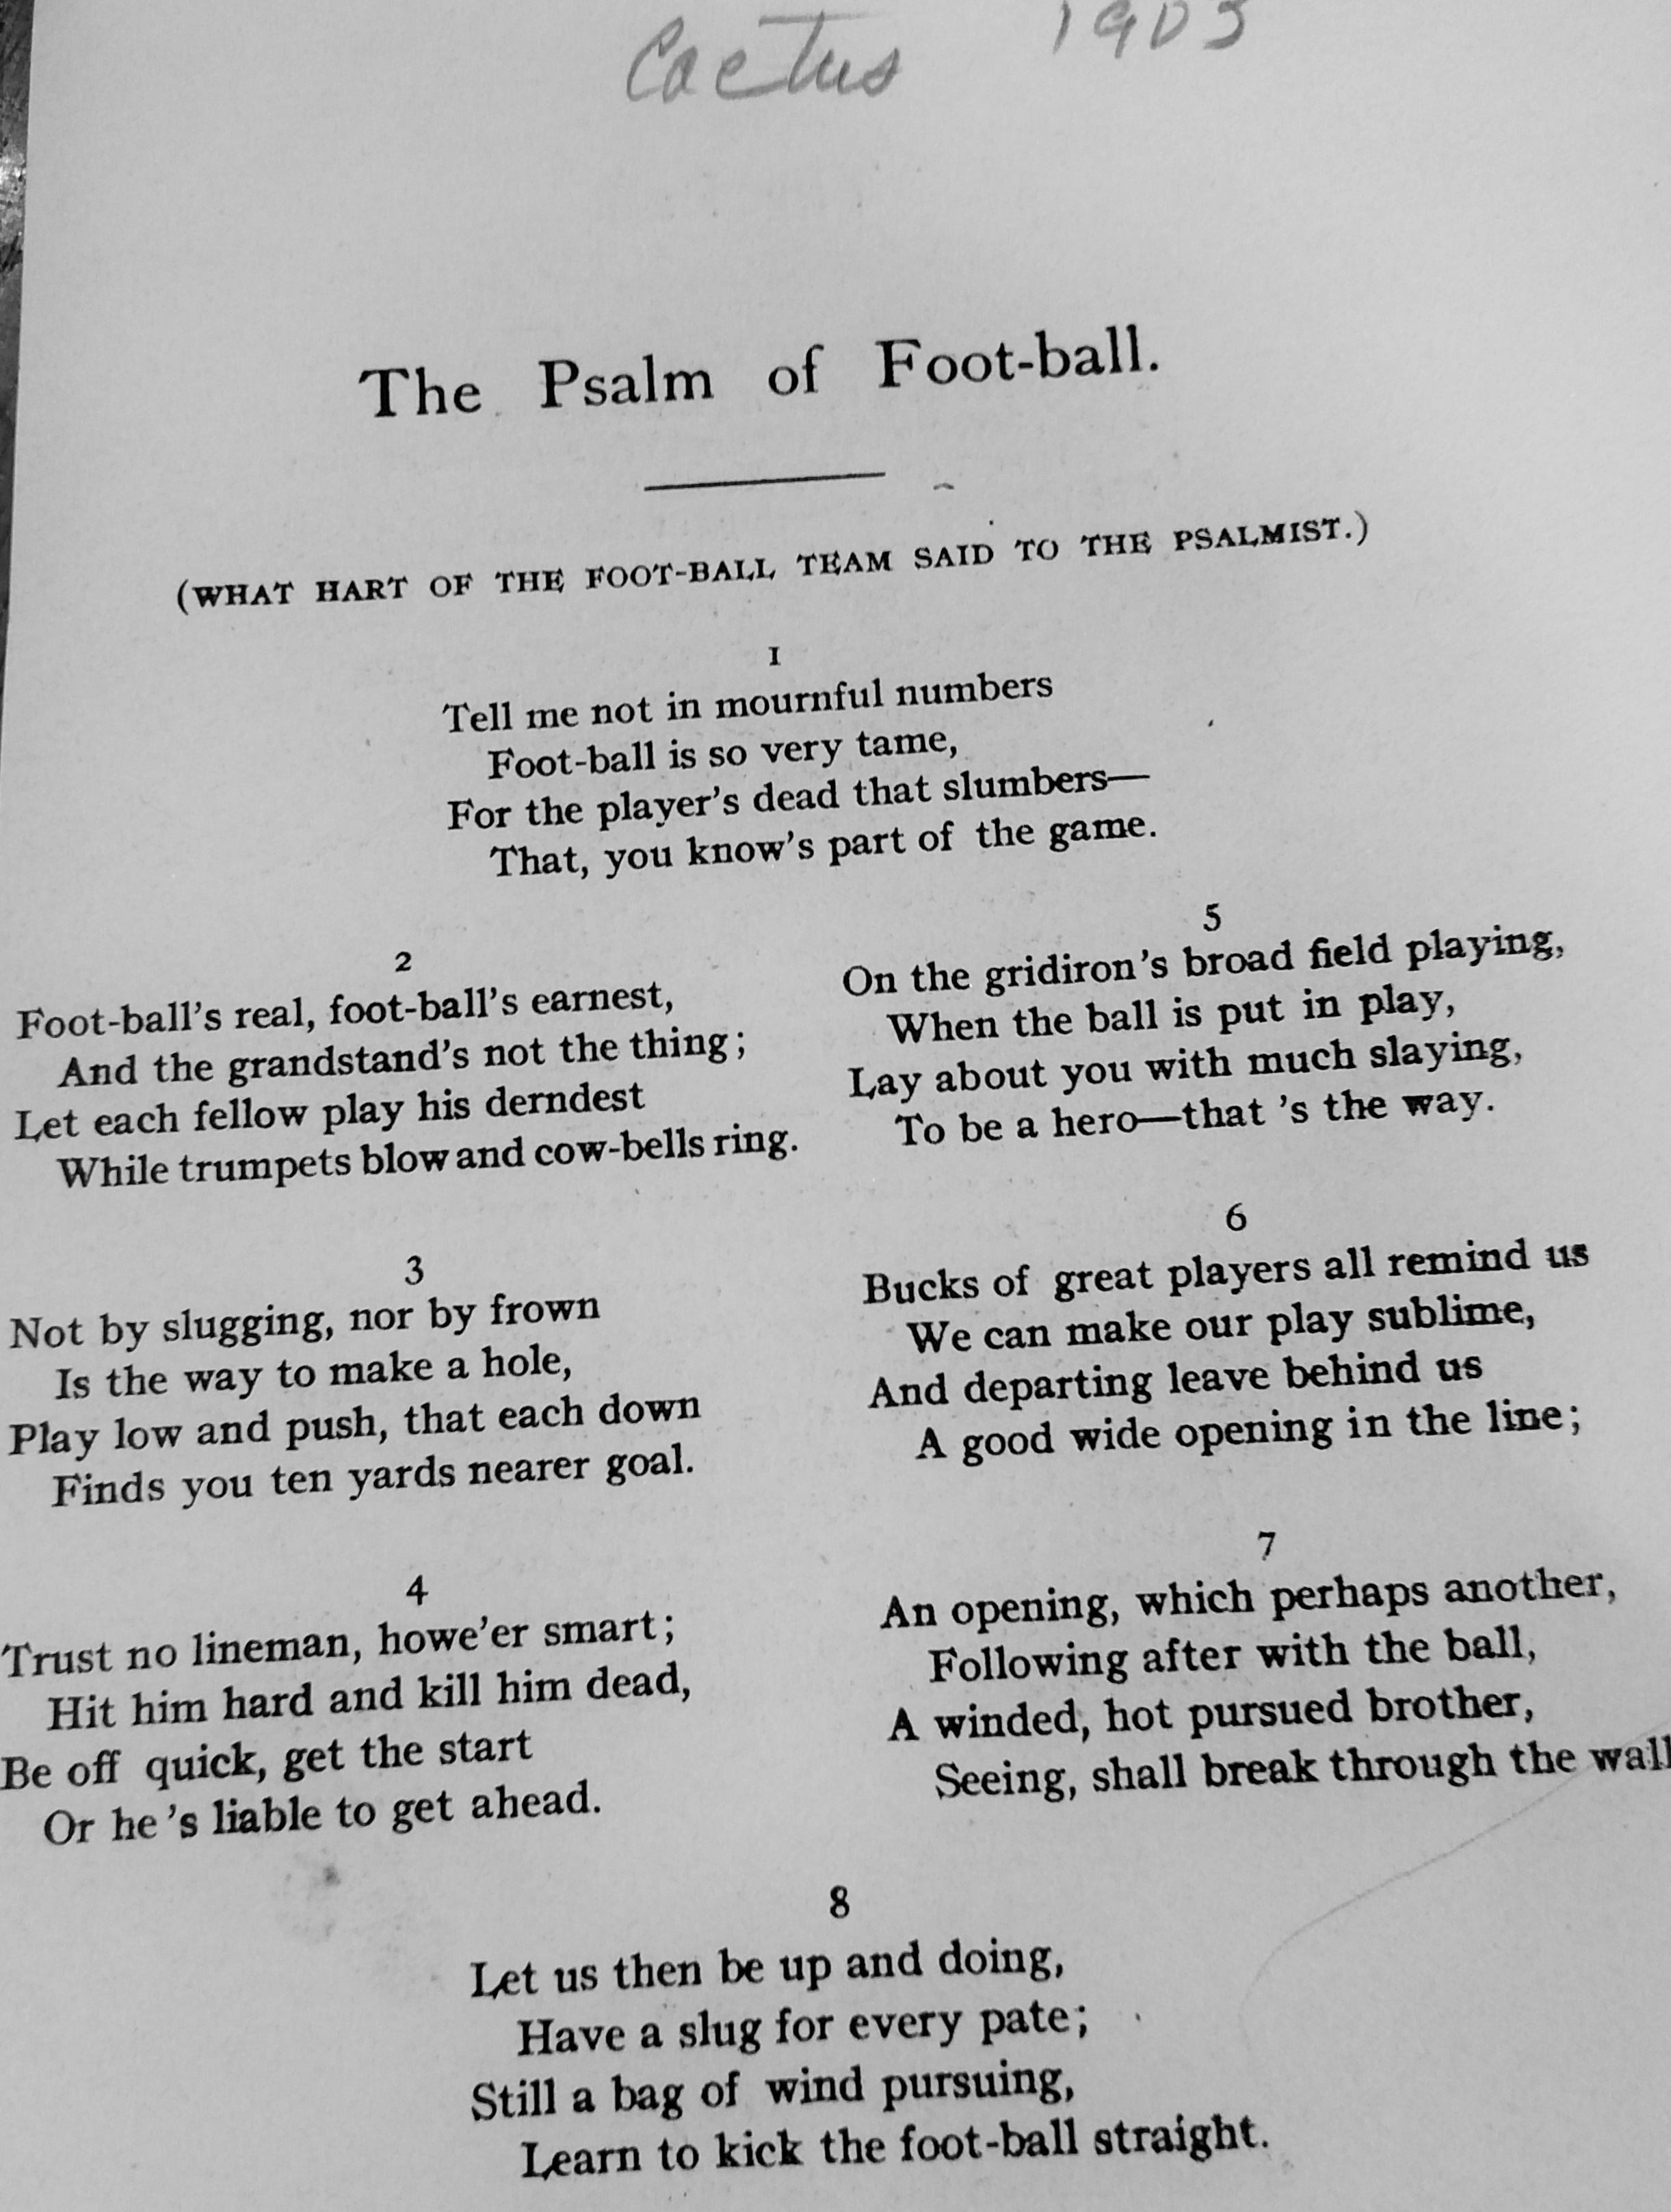 Hart writes the Psalm of Football